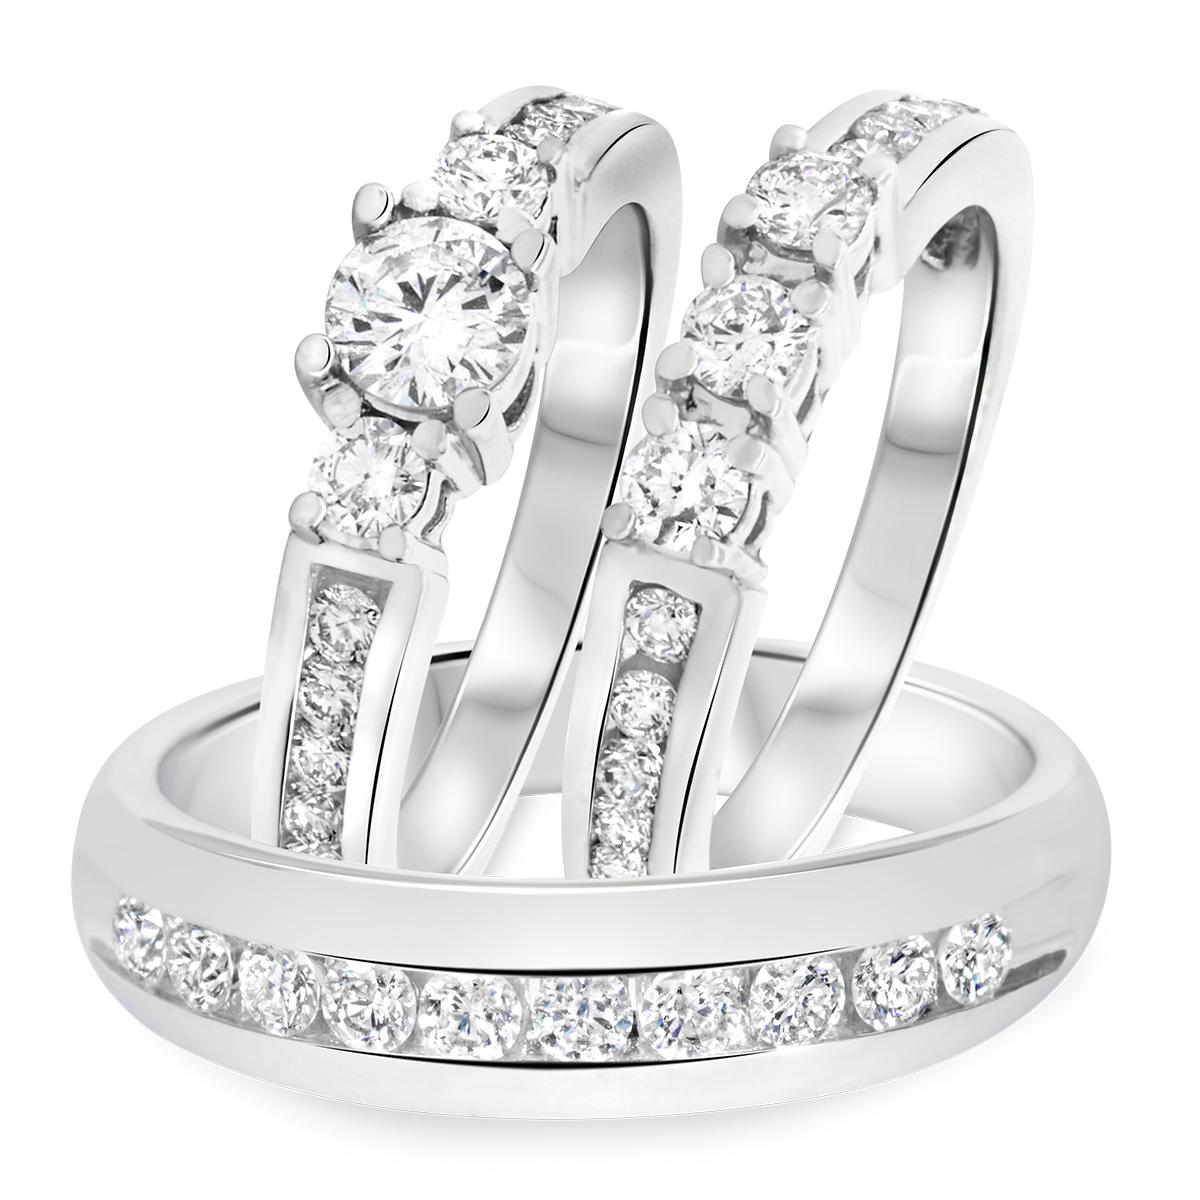 1 5/8 Carat T.W. Round Cut Diamond Mens Wedding Band 10K White Gold- Size 8